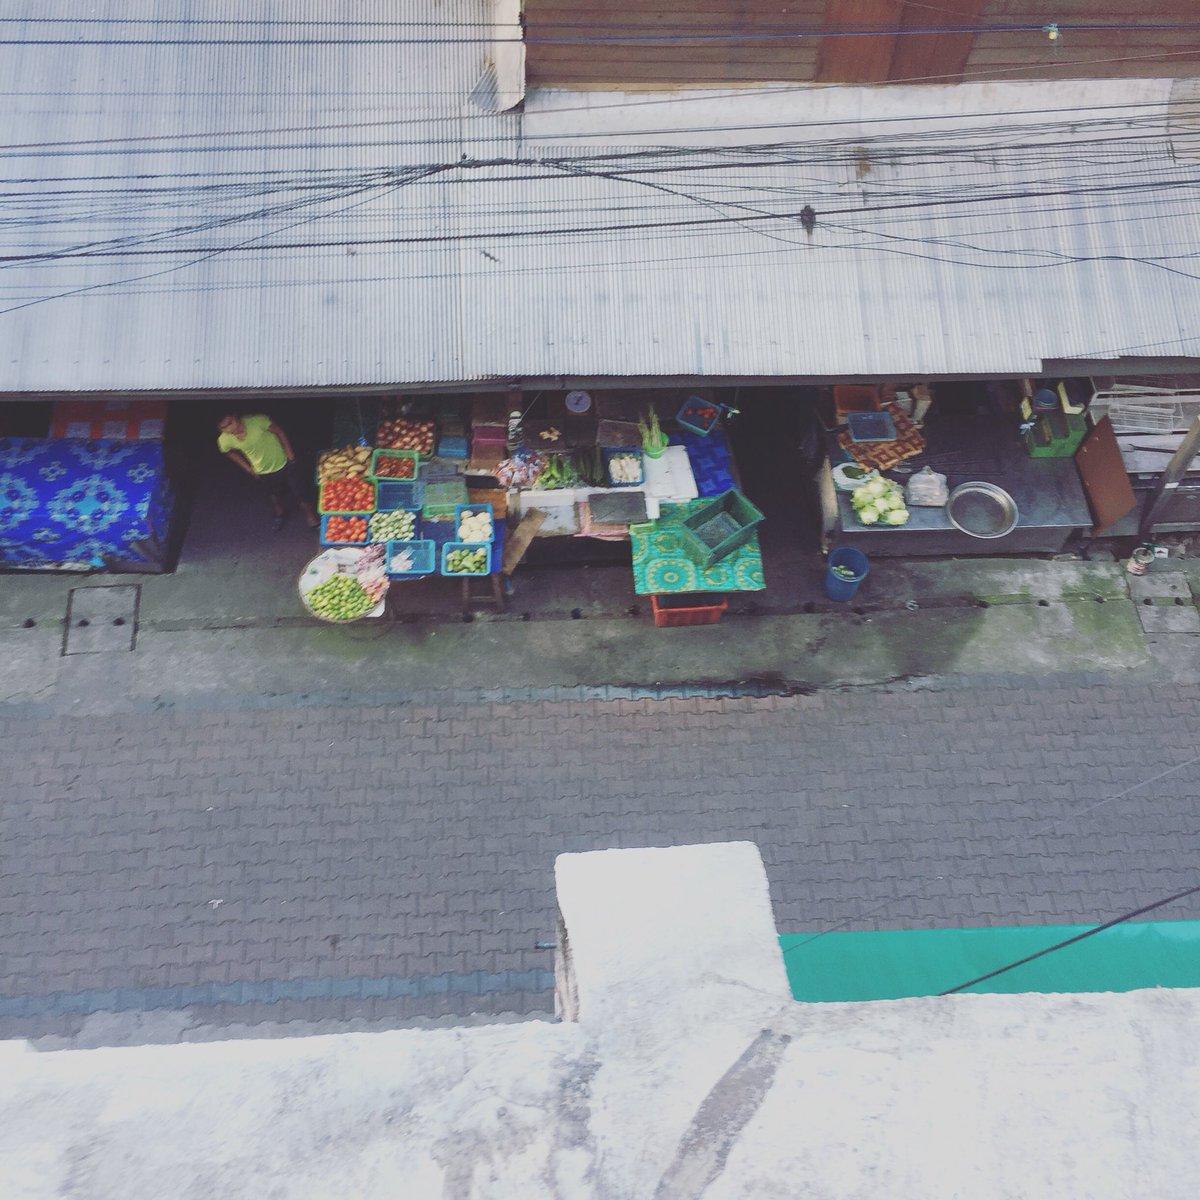 Good Morning Saturday.. The market is opened      #thunderbirdhostel #chiangmai #thailand #hostel #hostelinthailand #accommodation #happyplace #saturdaymorning #market #freshmarket #localpeople #goodvibes #reviewchiangmai <br>http://pic.twitter.com/TZJHR3RSIR